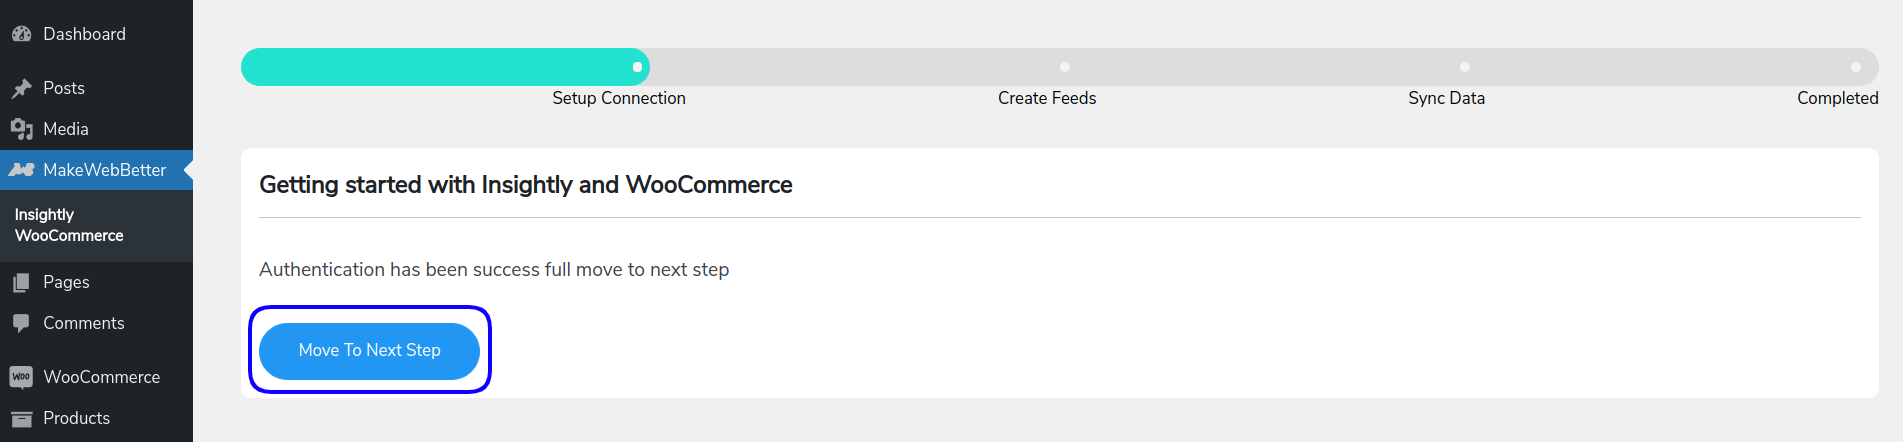 verification success dashboard